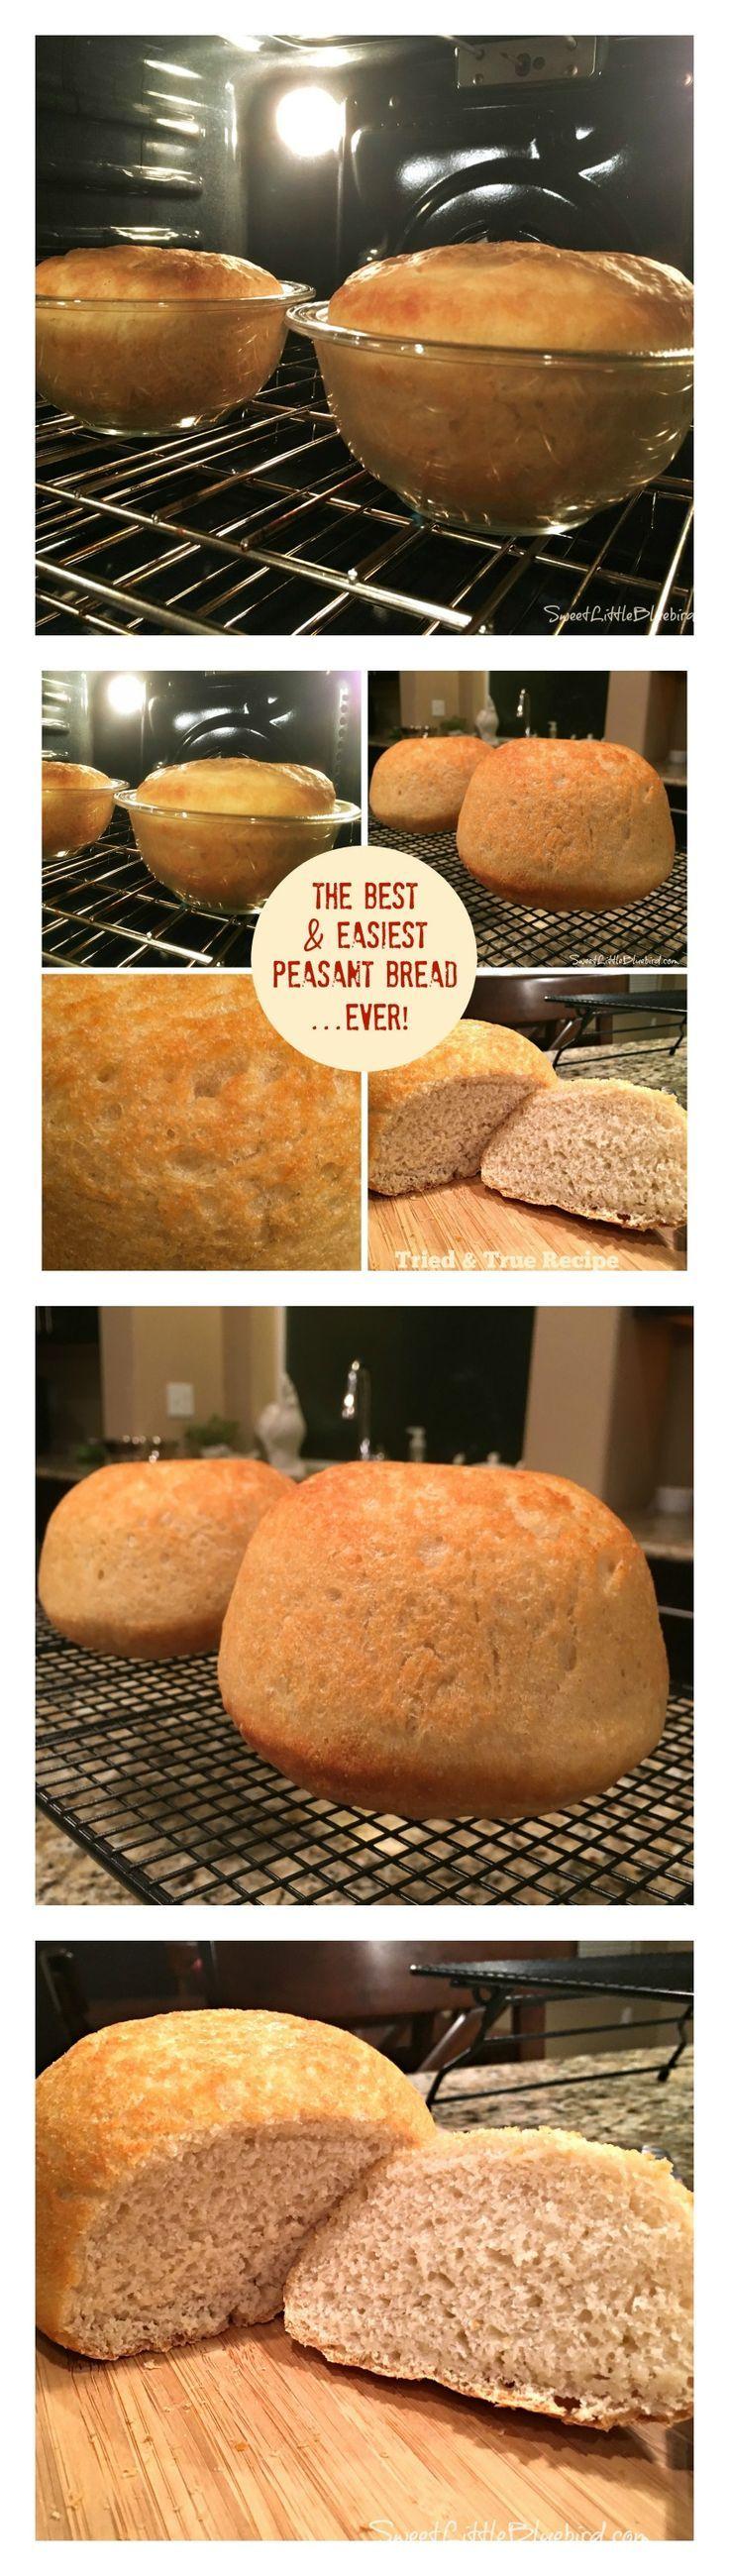 THE BEST- EASIEST PEASANT BREAD....EVER!! No-kneading!! |  SweetLittleBluebird.com